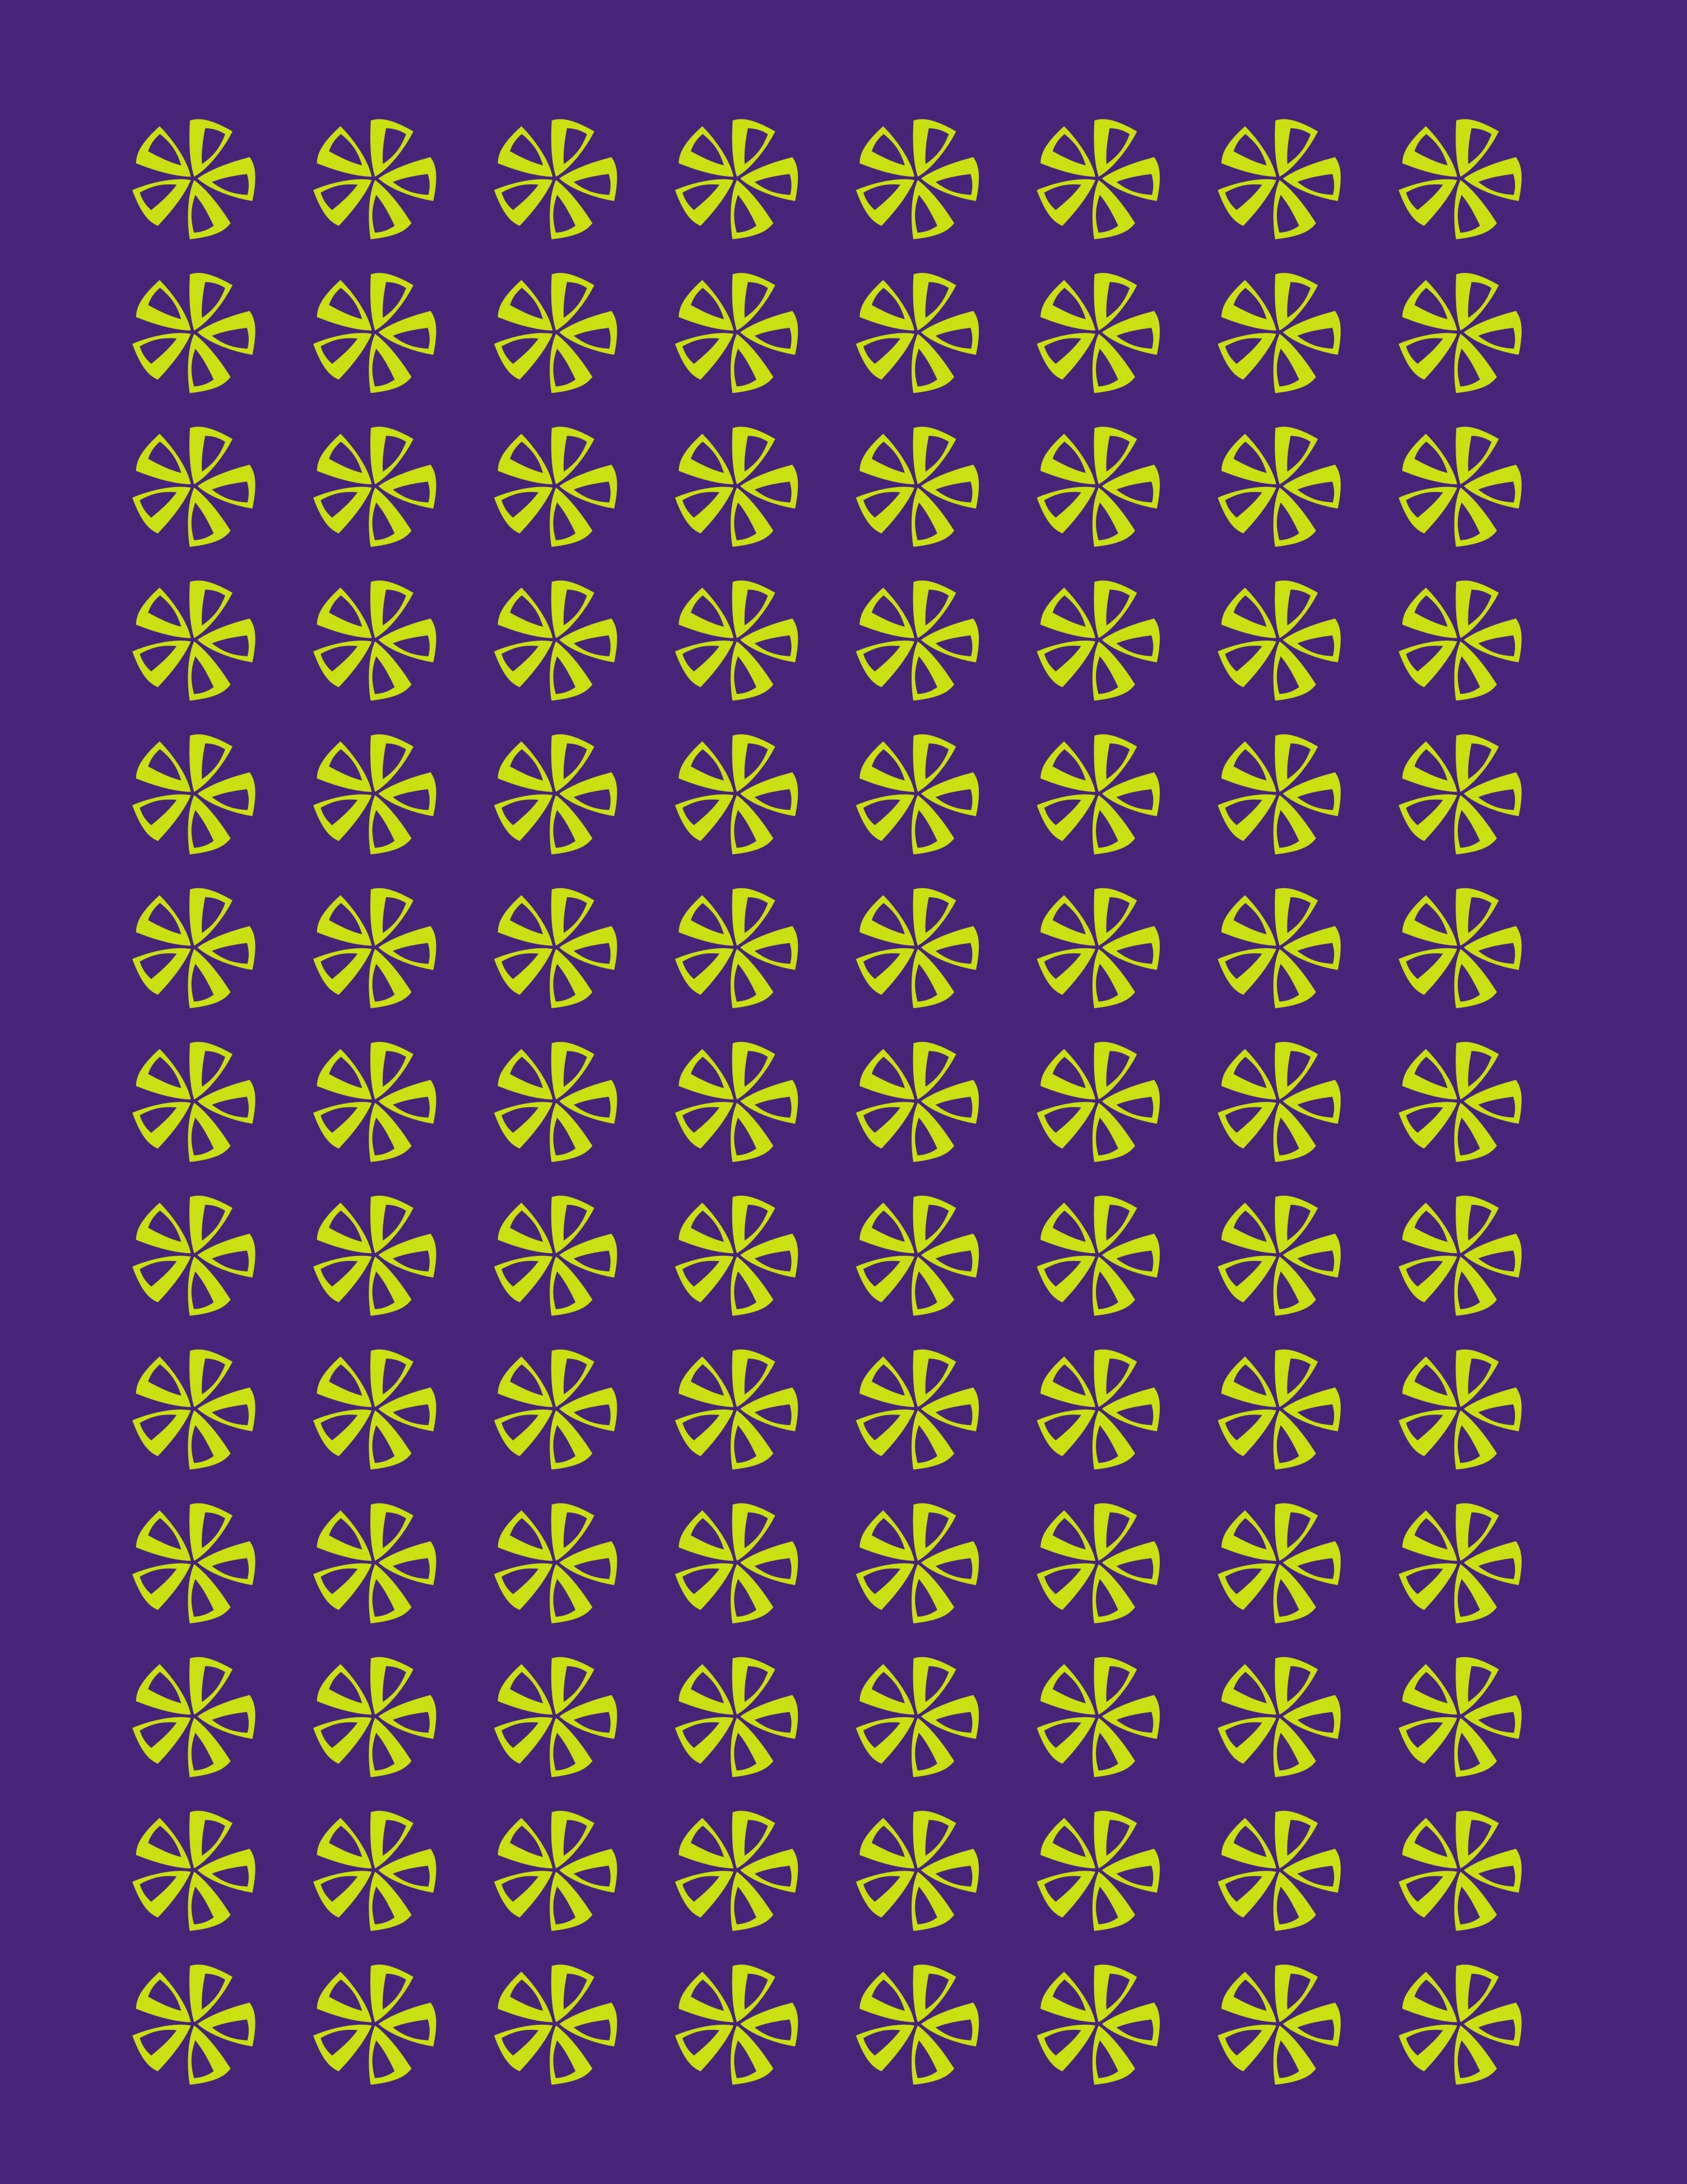 Pattern 2 Tling